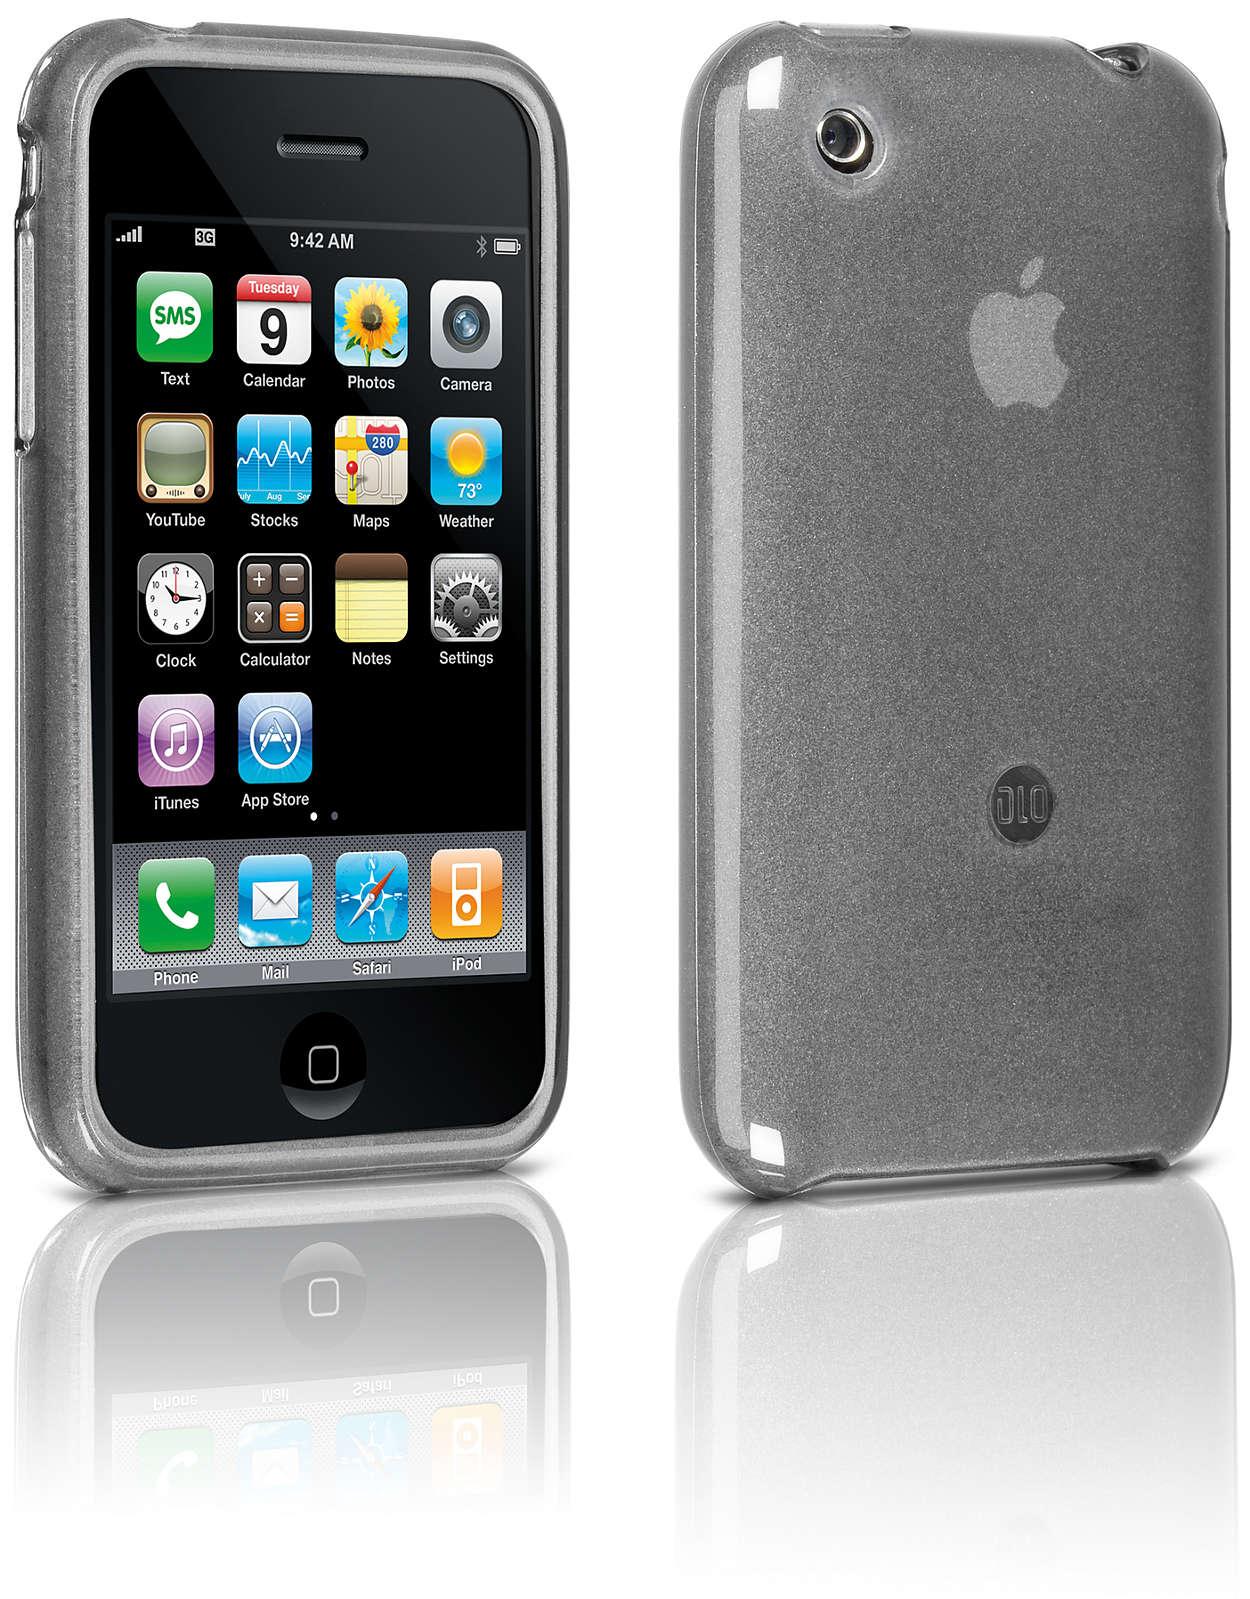 Beskyt din iPhone i et fleksibelt etui,